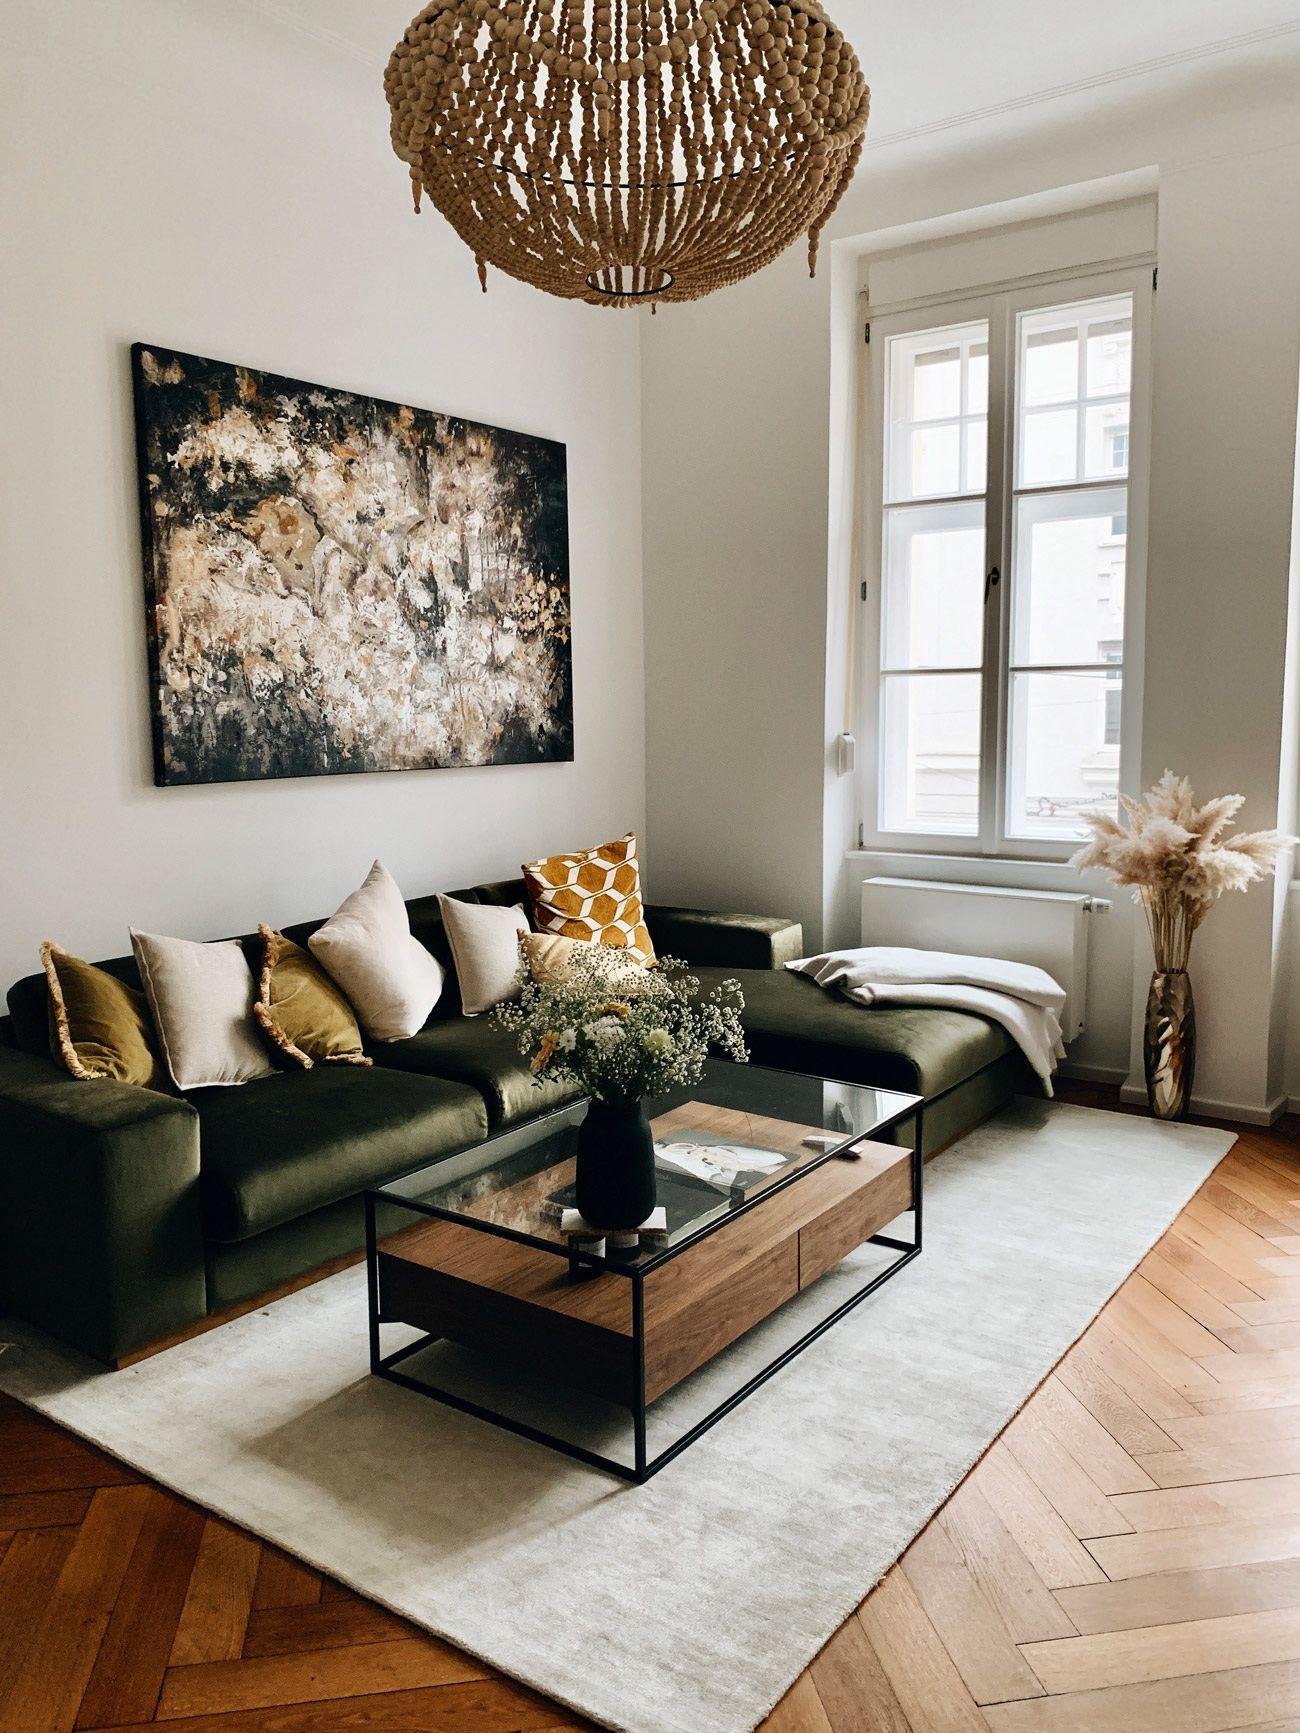 Khaki Sofa Living Room 2019 In 2020 Living Room Designs Home Interior Design